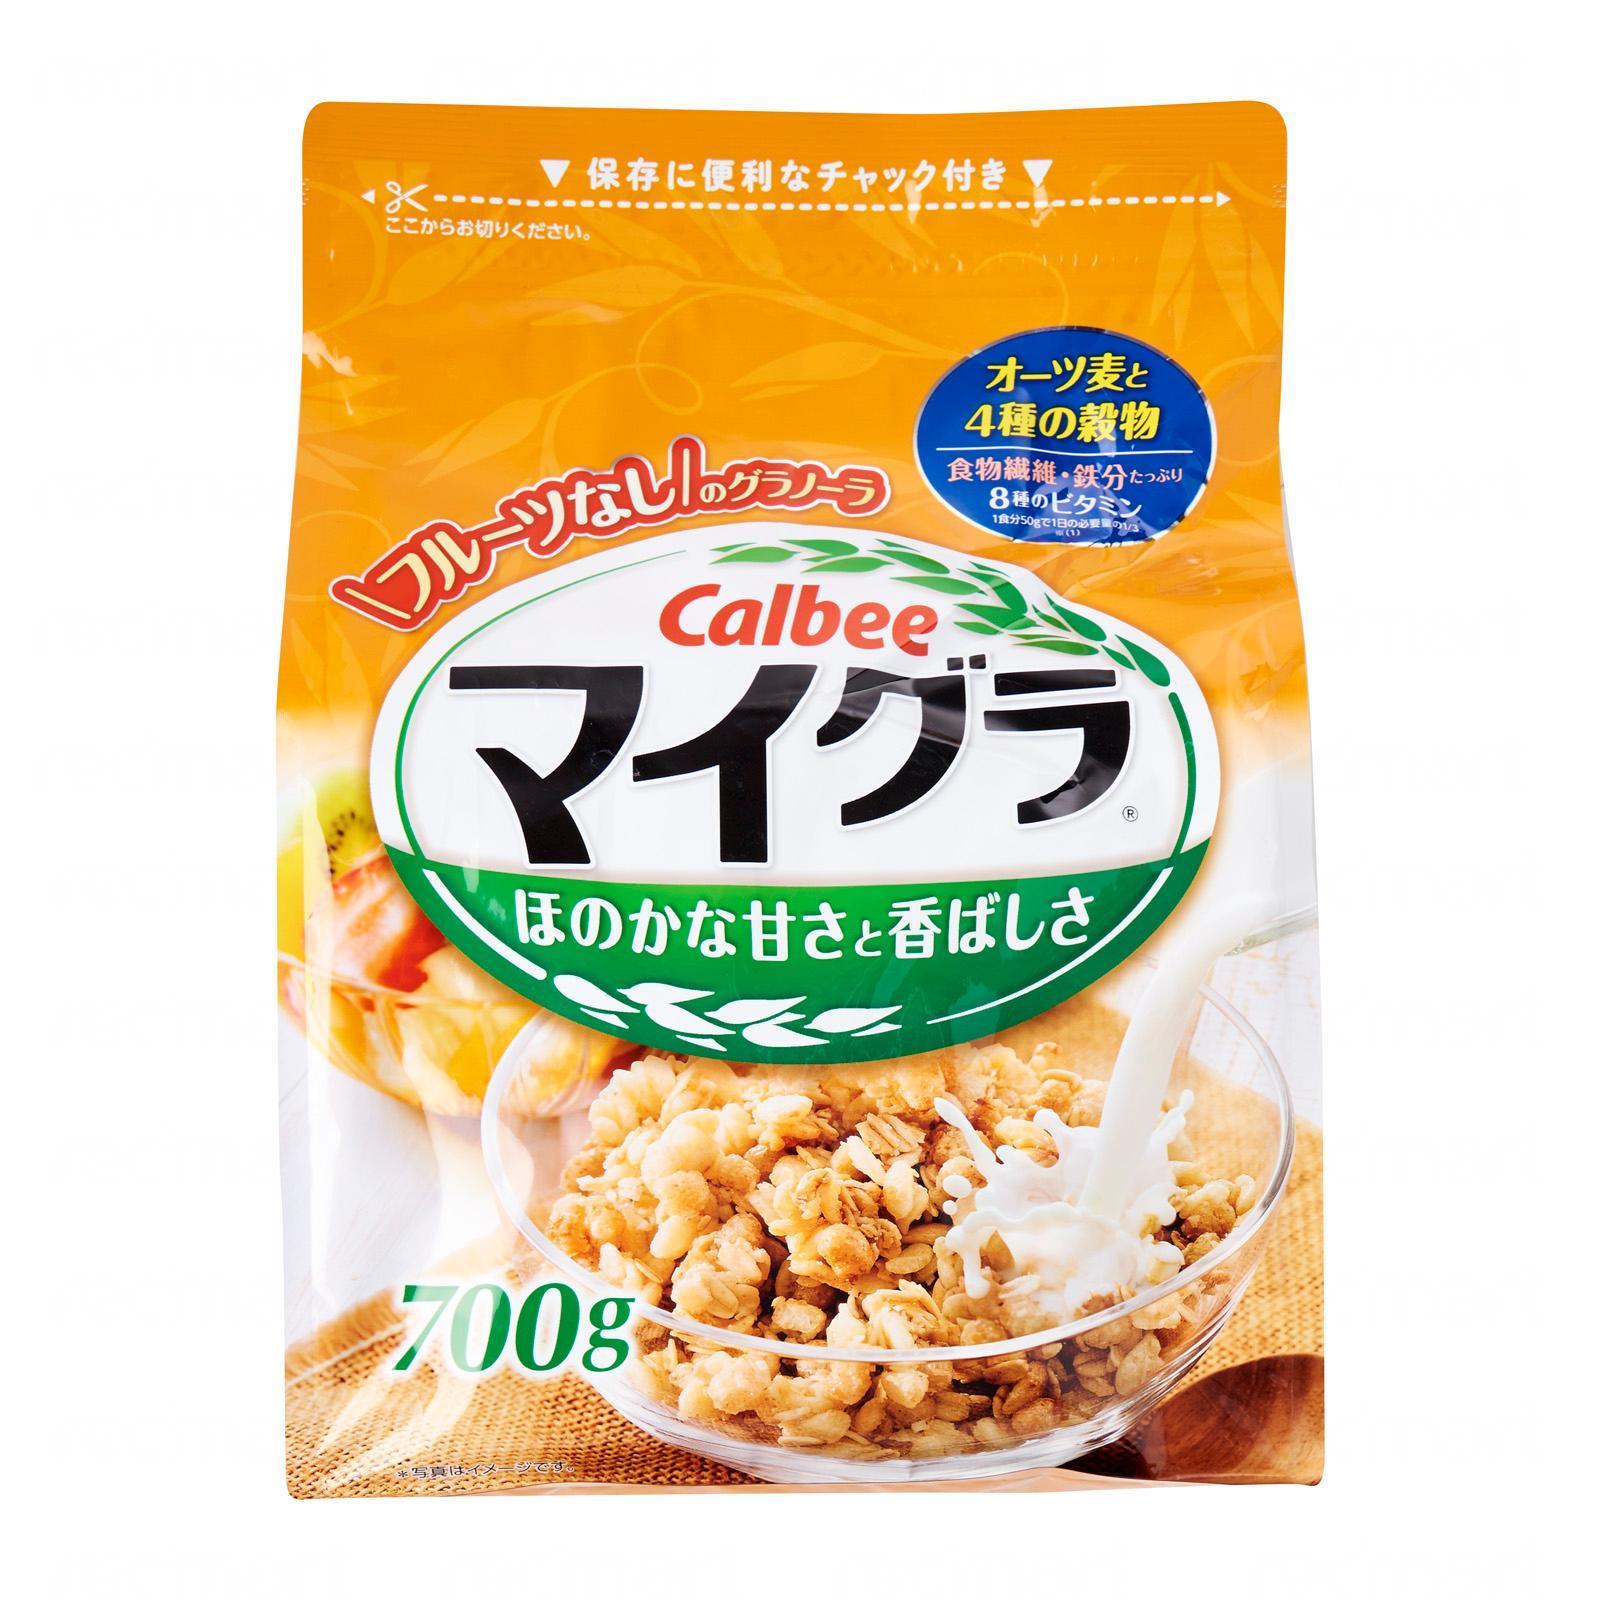 Calbee Plain Flavour Oats Breakfast Granola